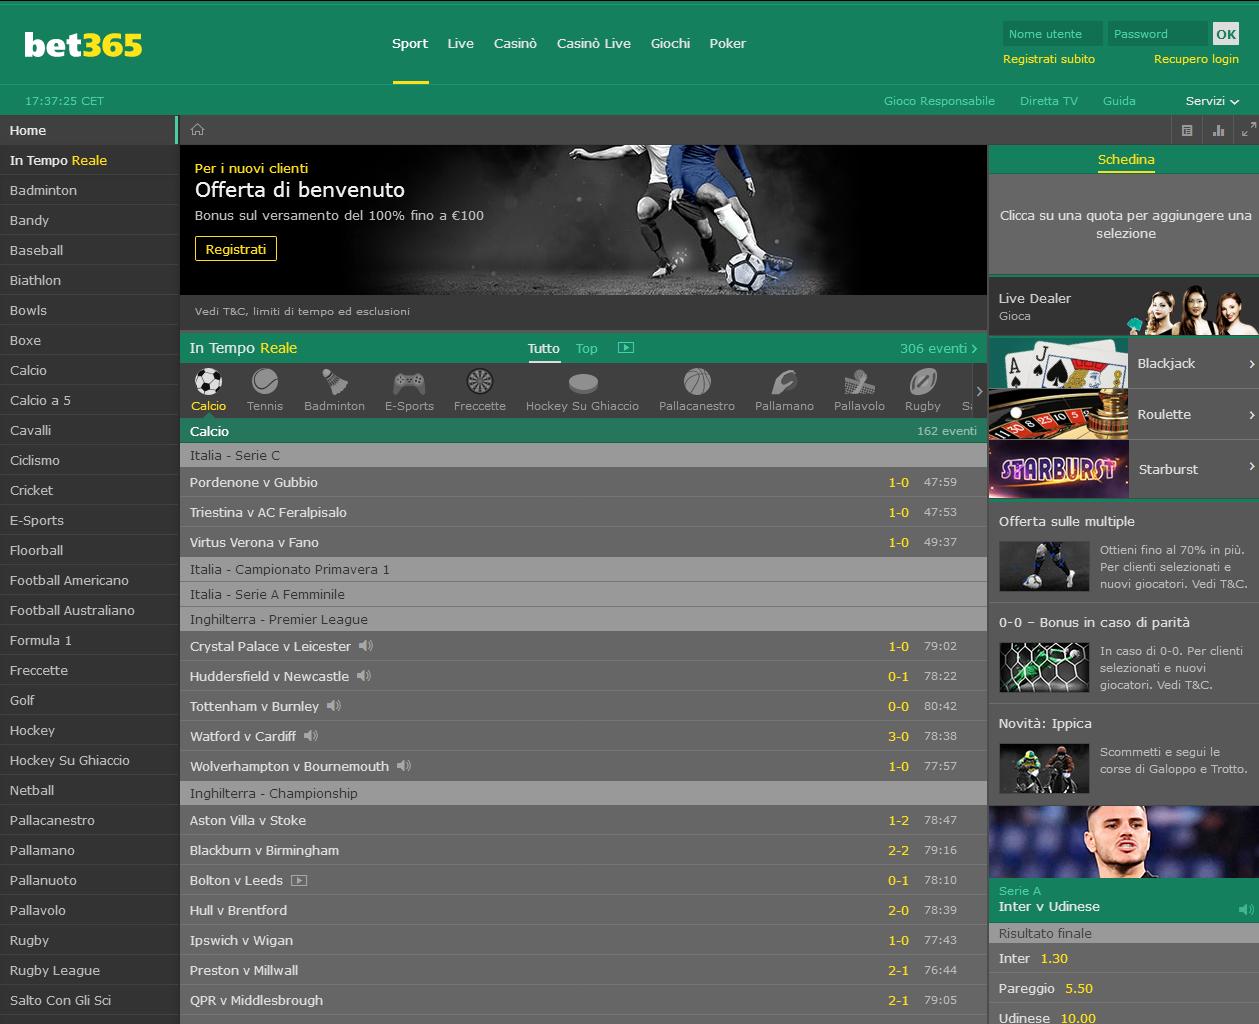 Infobetting bet365 mix parlay betting tips